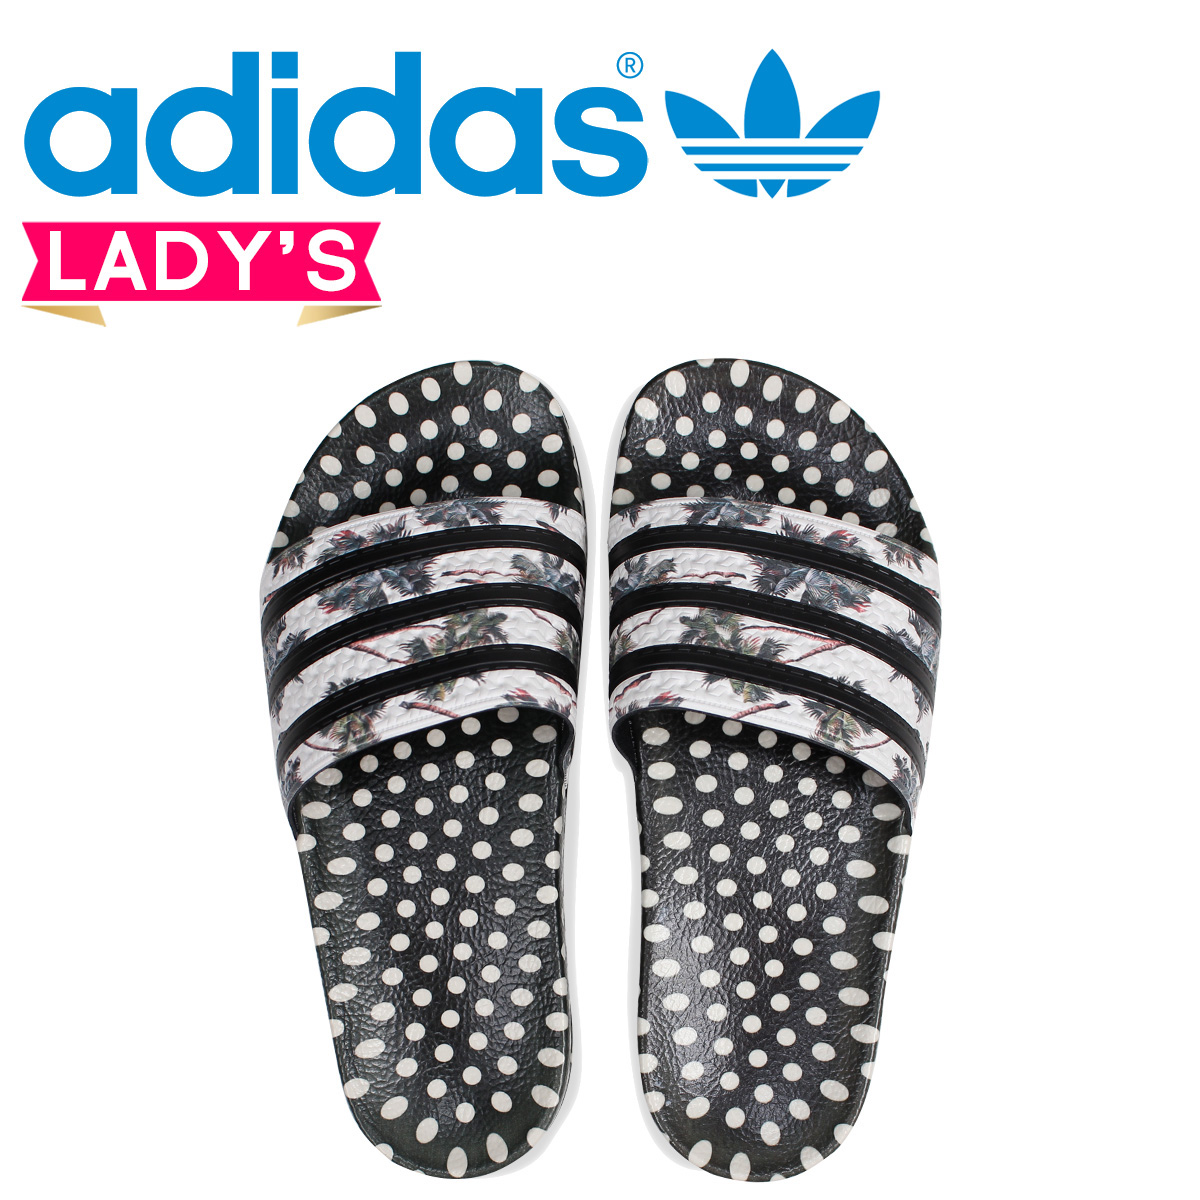 91587b3ab アディダスオリジナルスアディレッタ adidas Originals Lady s sandals shower sandals ADILETTE W  CM8224 black